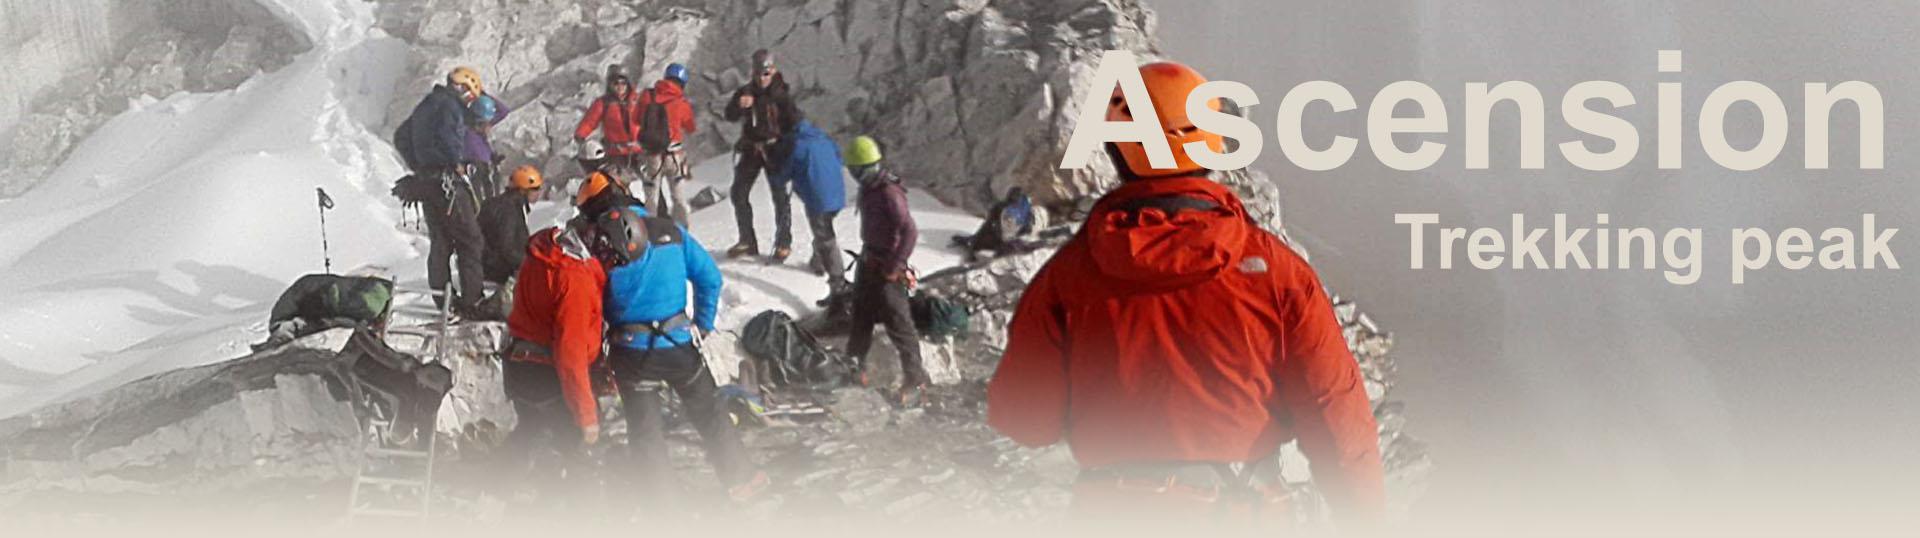 Ascension Trekking peak Himalaya